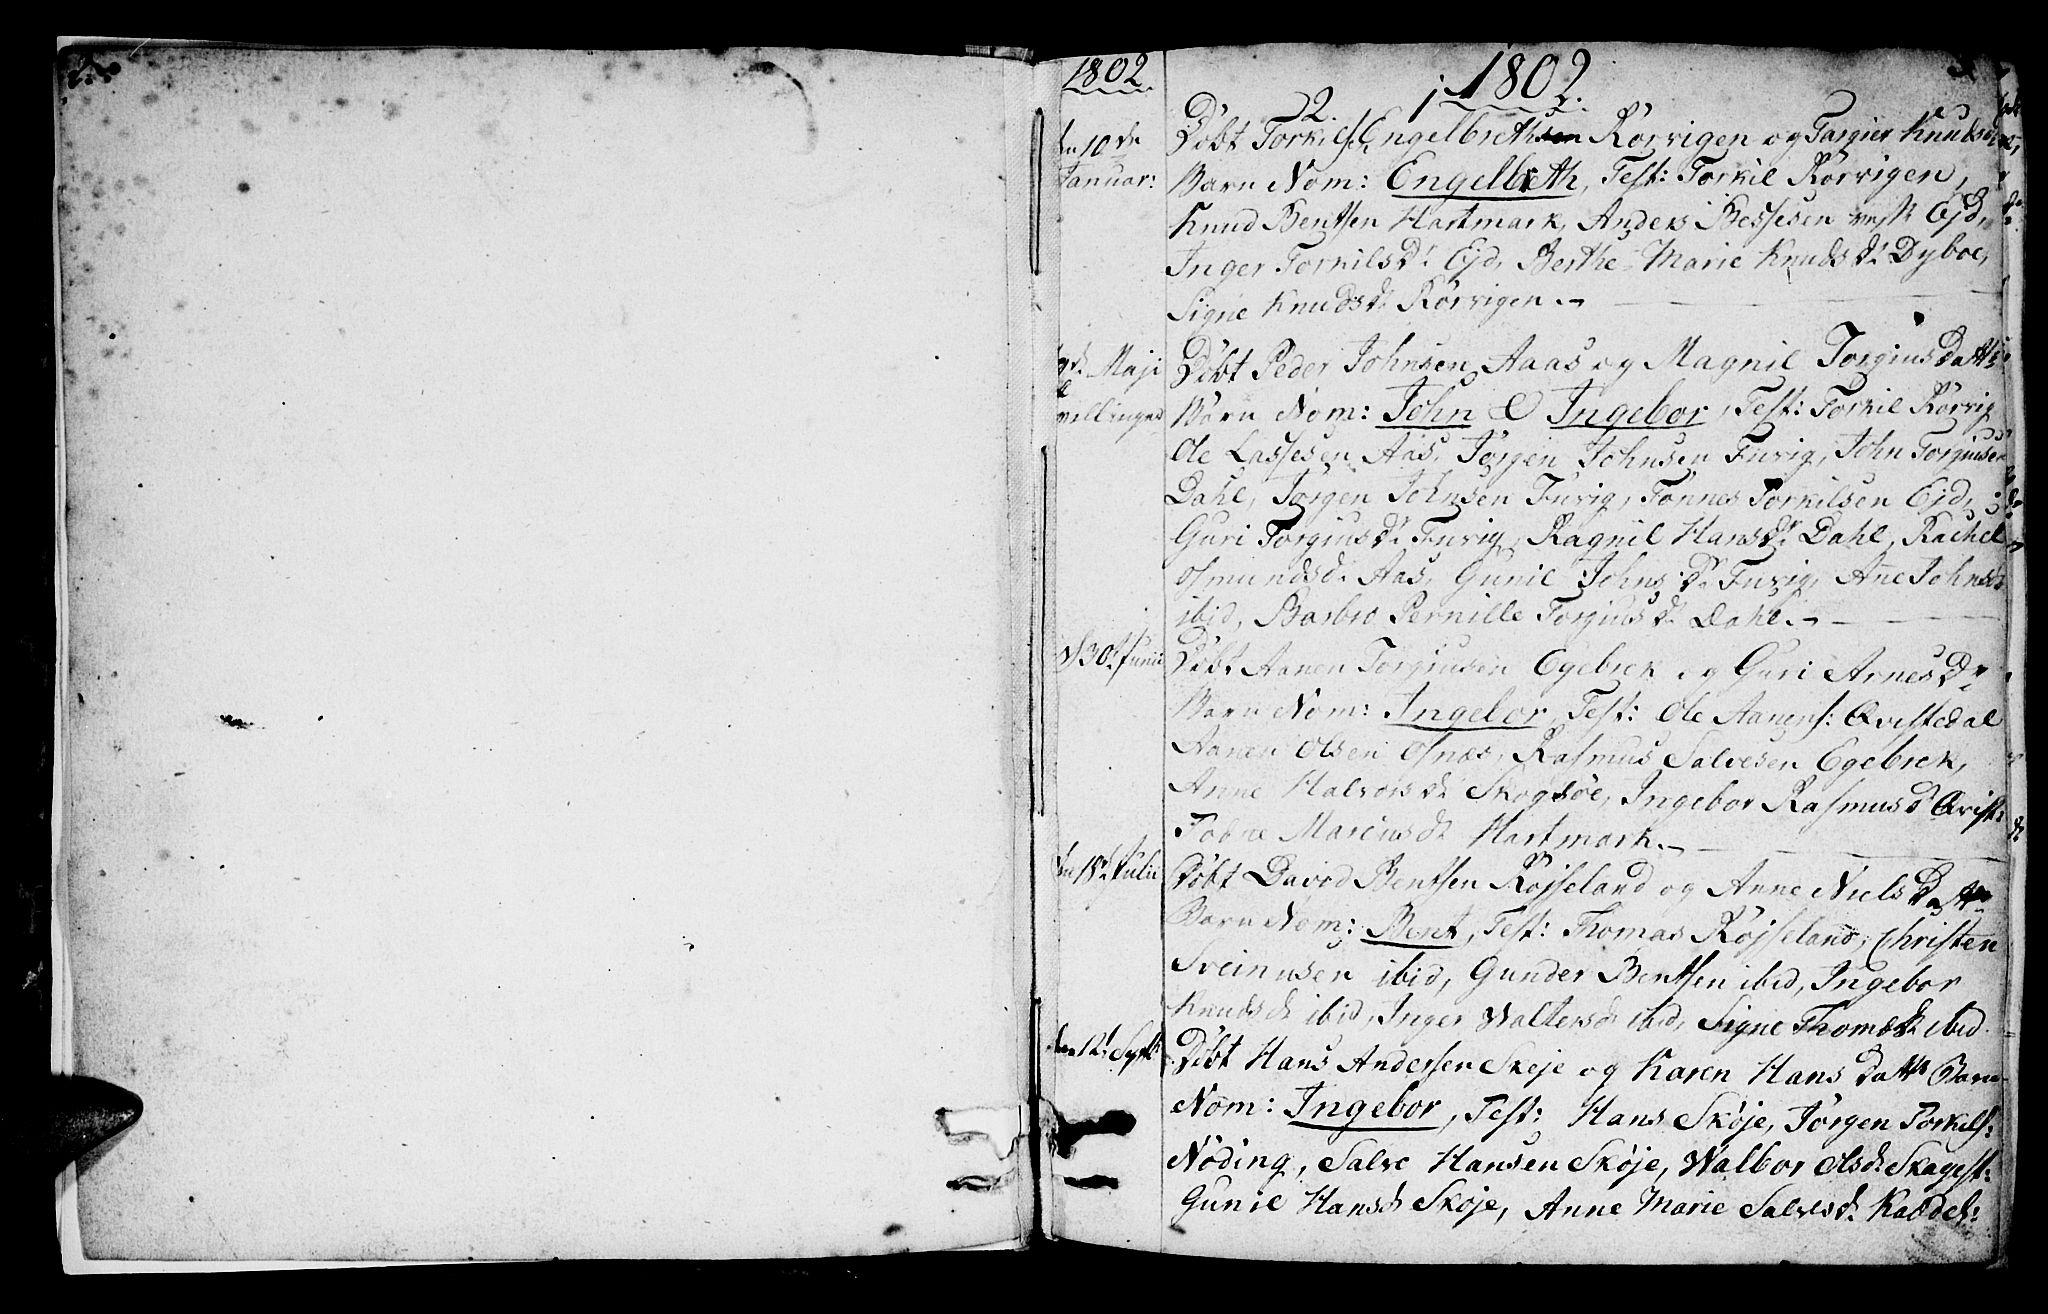 SAK, Mandal sokneprestkontor, F/Fb/Fbb/L0001: Klokkerbok nr. B 1, 1802-1846, s. 2-3